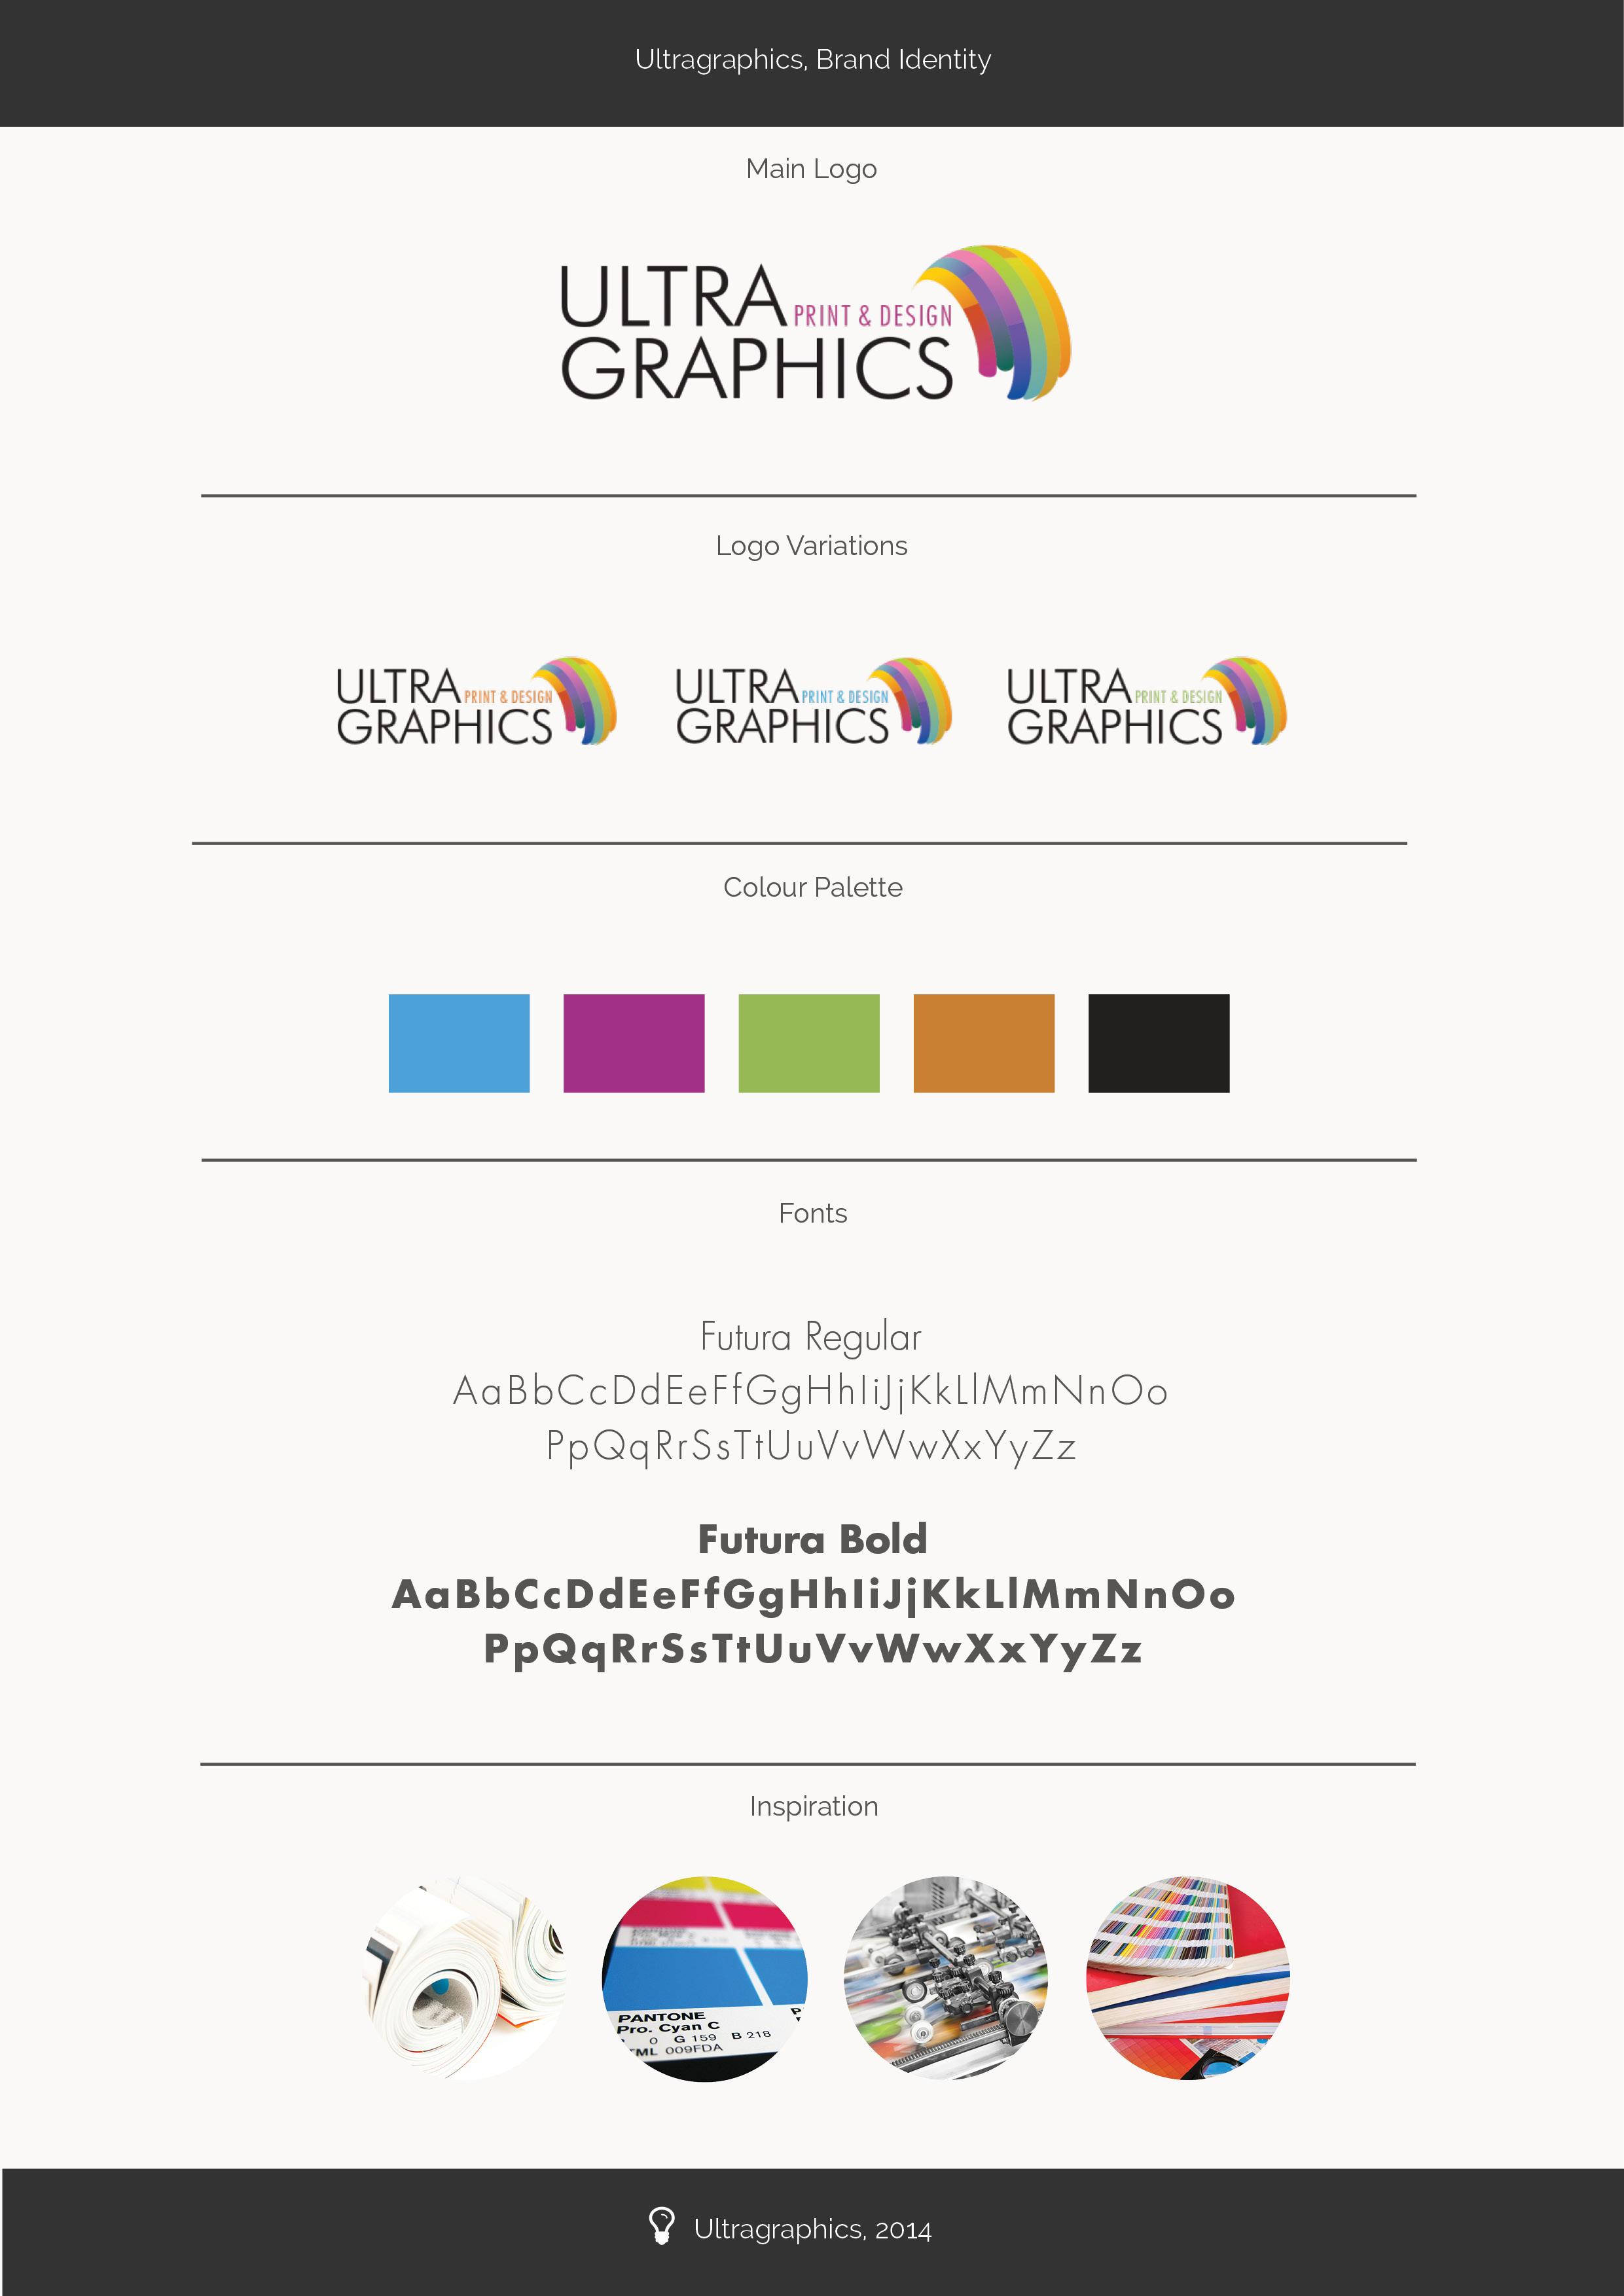 Brand Identity Ultragraphics